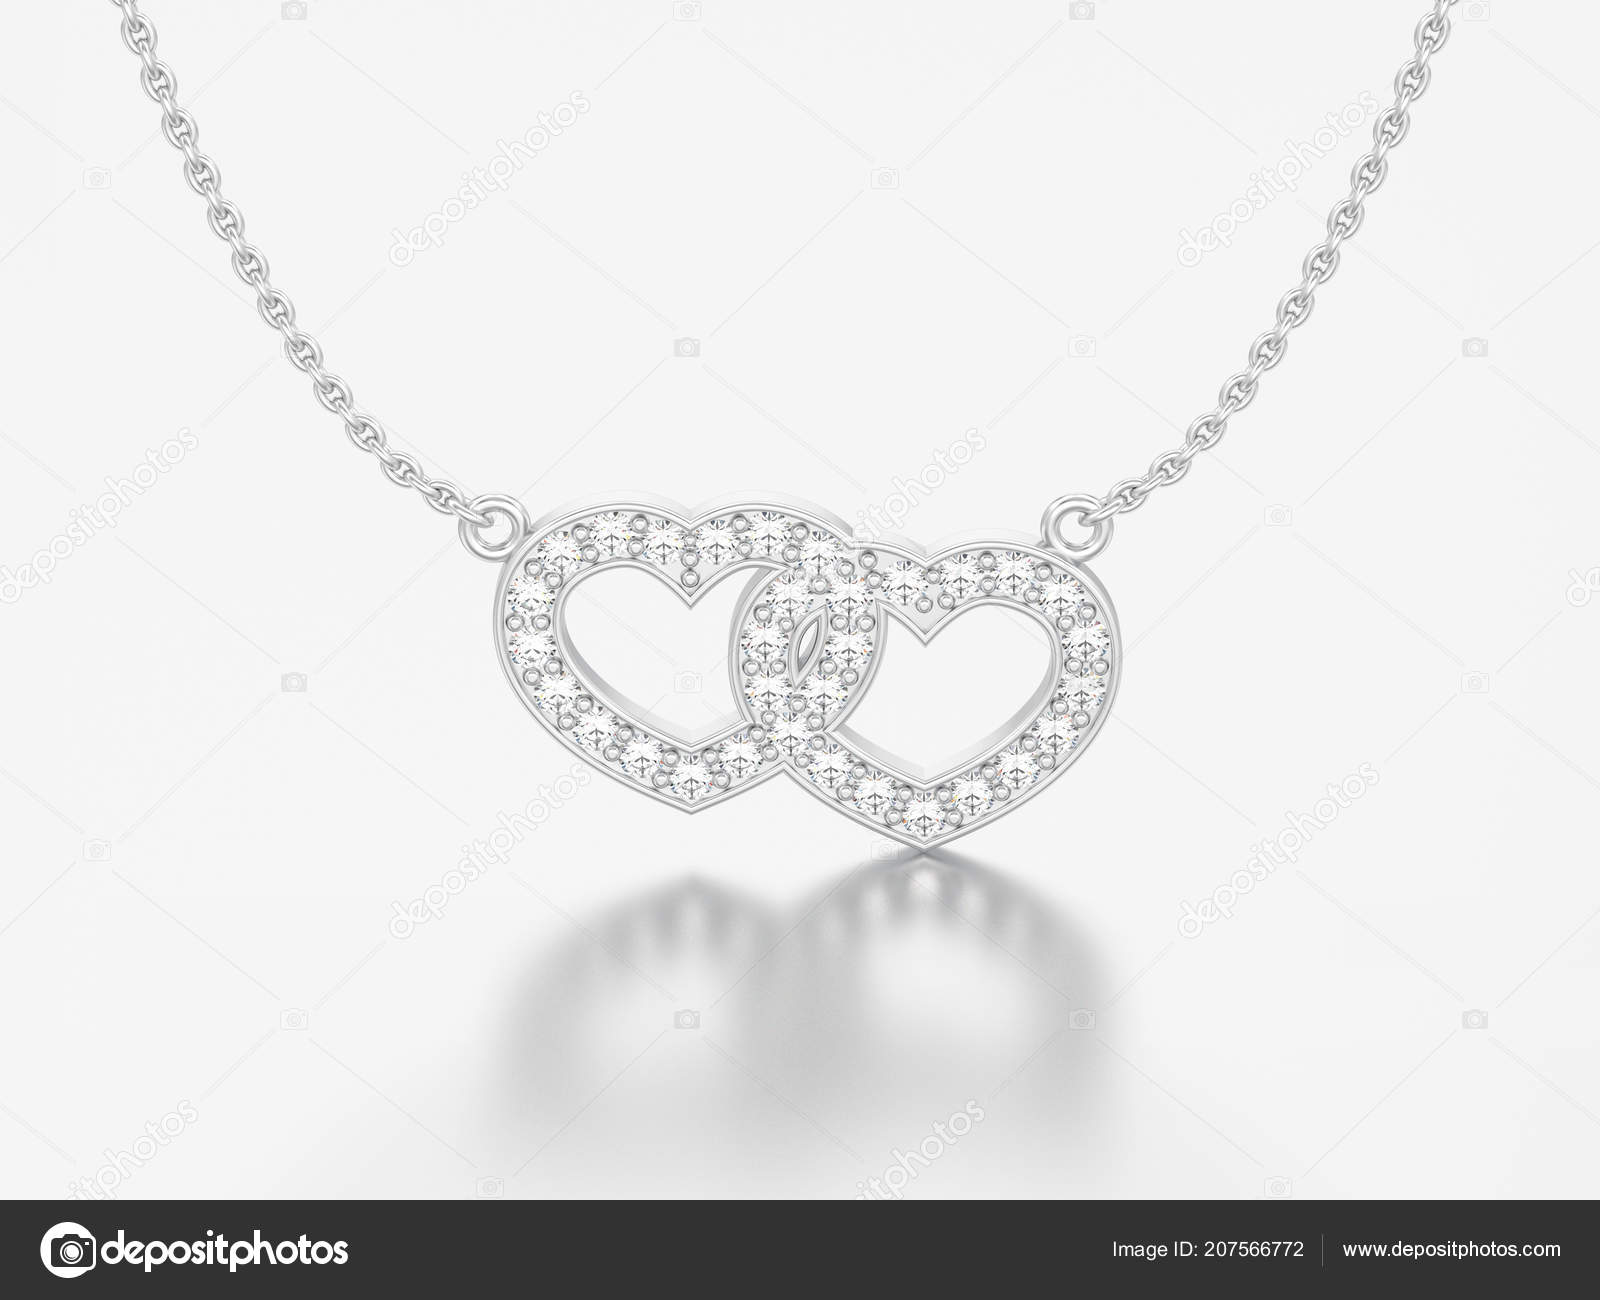 82640538db 3D απεικόνιση κοσμήματα δύο καρδιές λευκό χρυσό ή ασήμι διαμαντένιο κολιέ  αλυσίδα σε γκρίζο φόντο — Εικόνα από ...